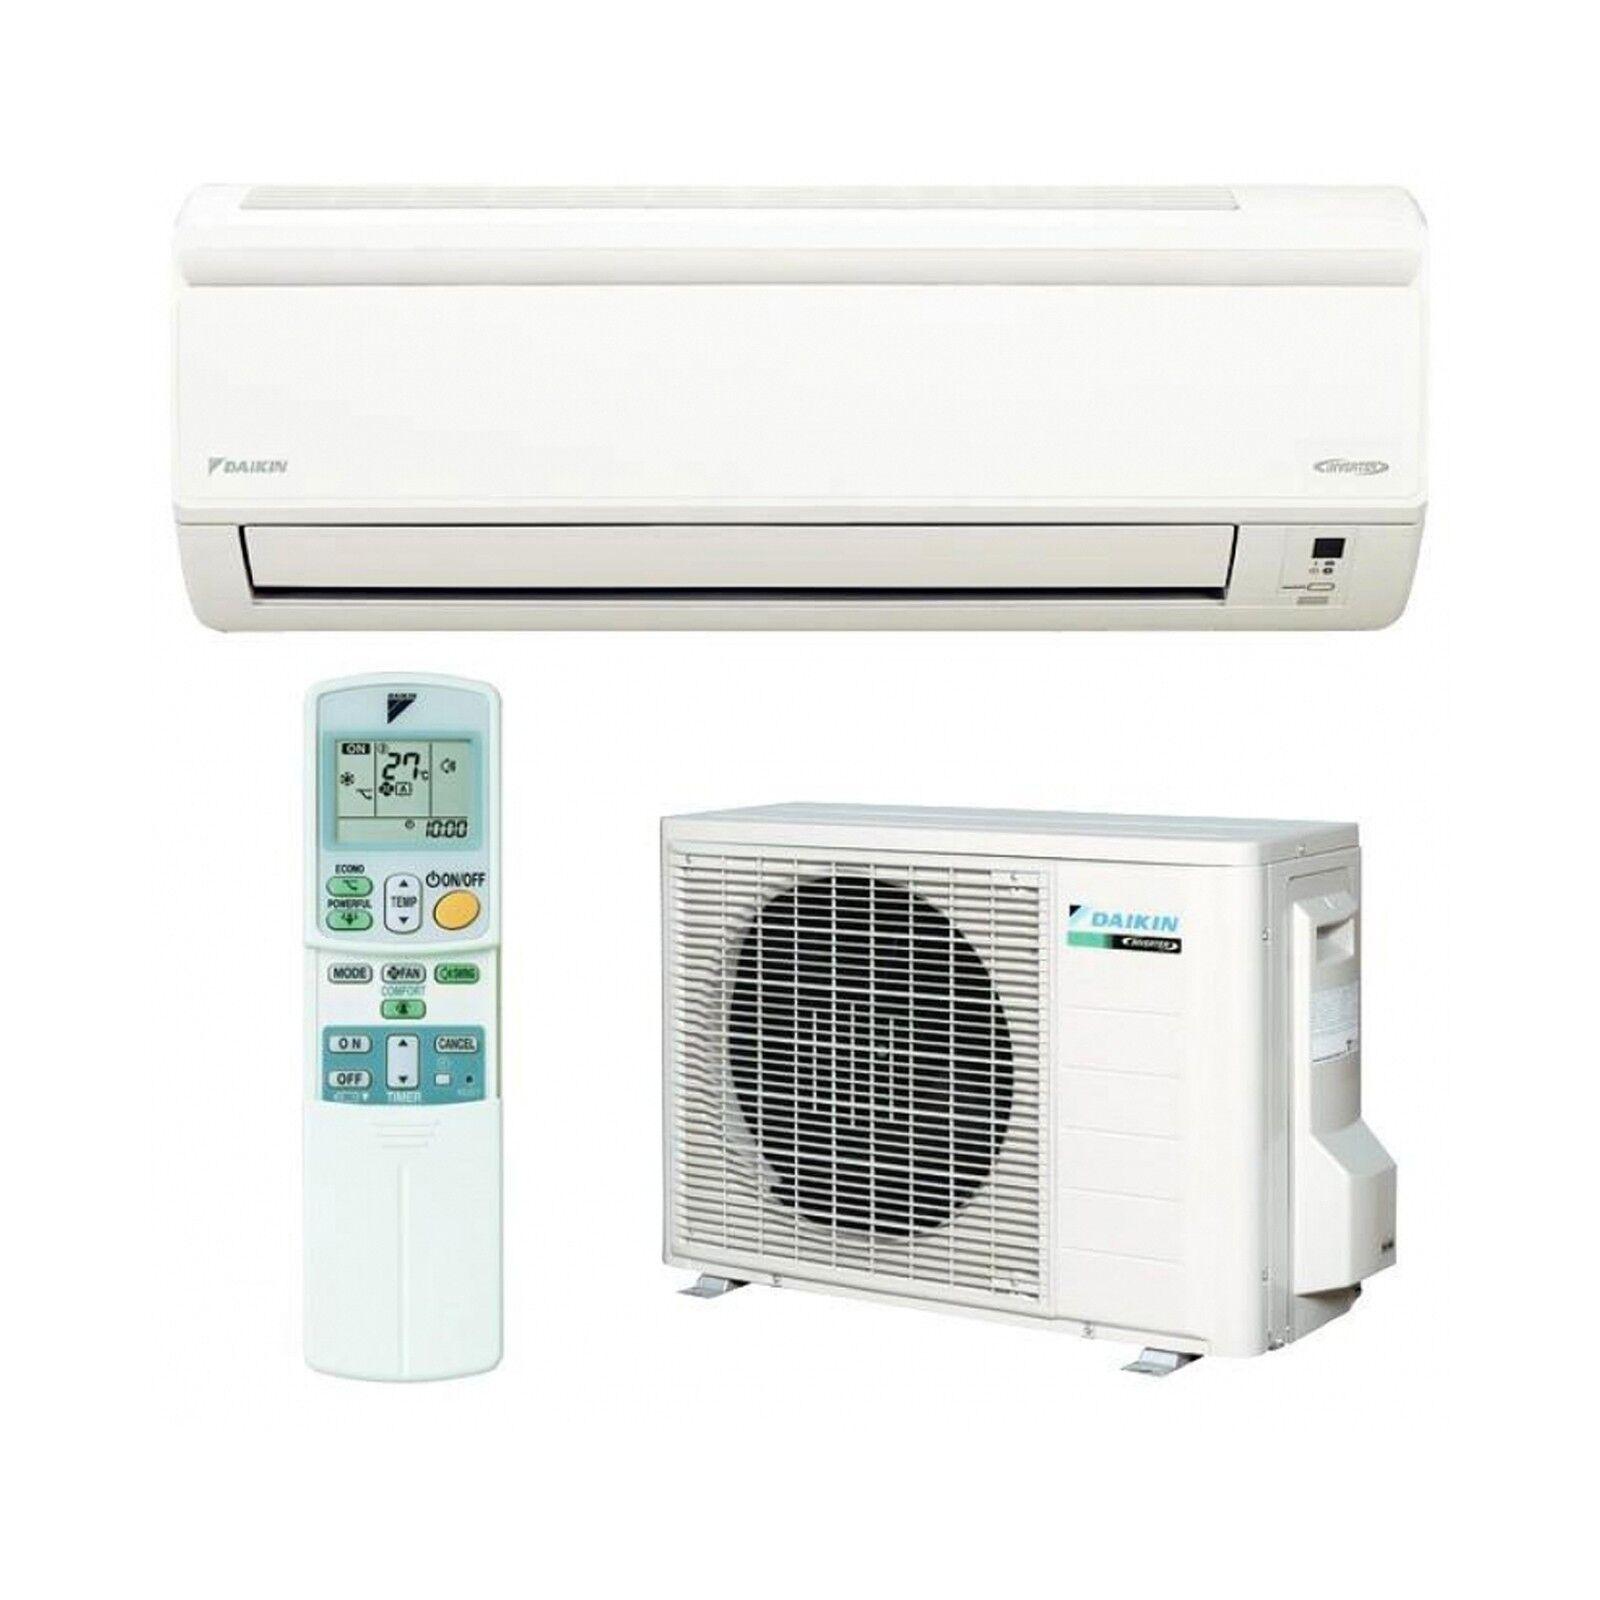 Daikin climatizzatore / condizionatore daikin 12000 btu ftx35jv rx35jv monosplit inverter